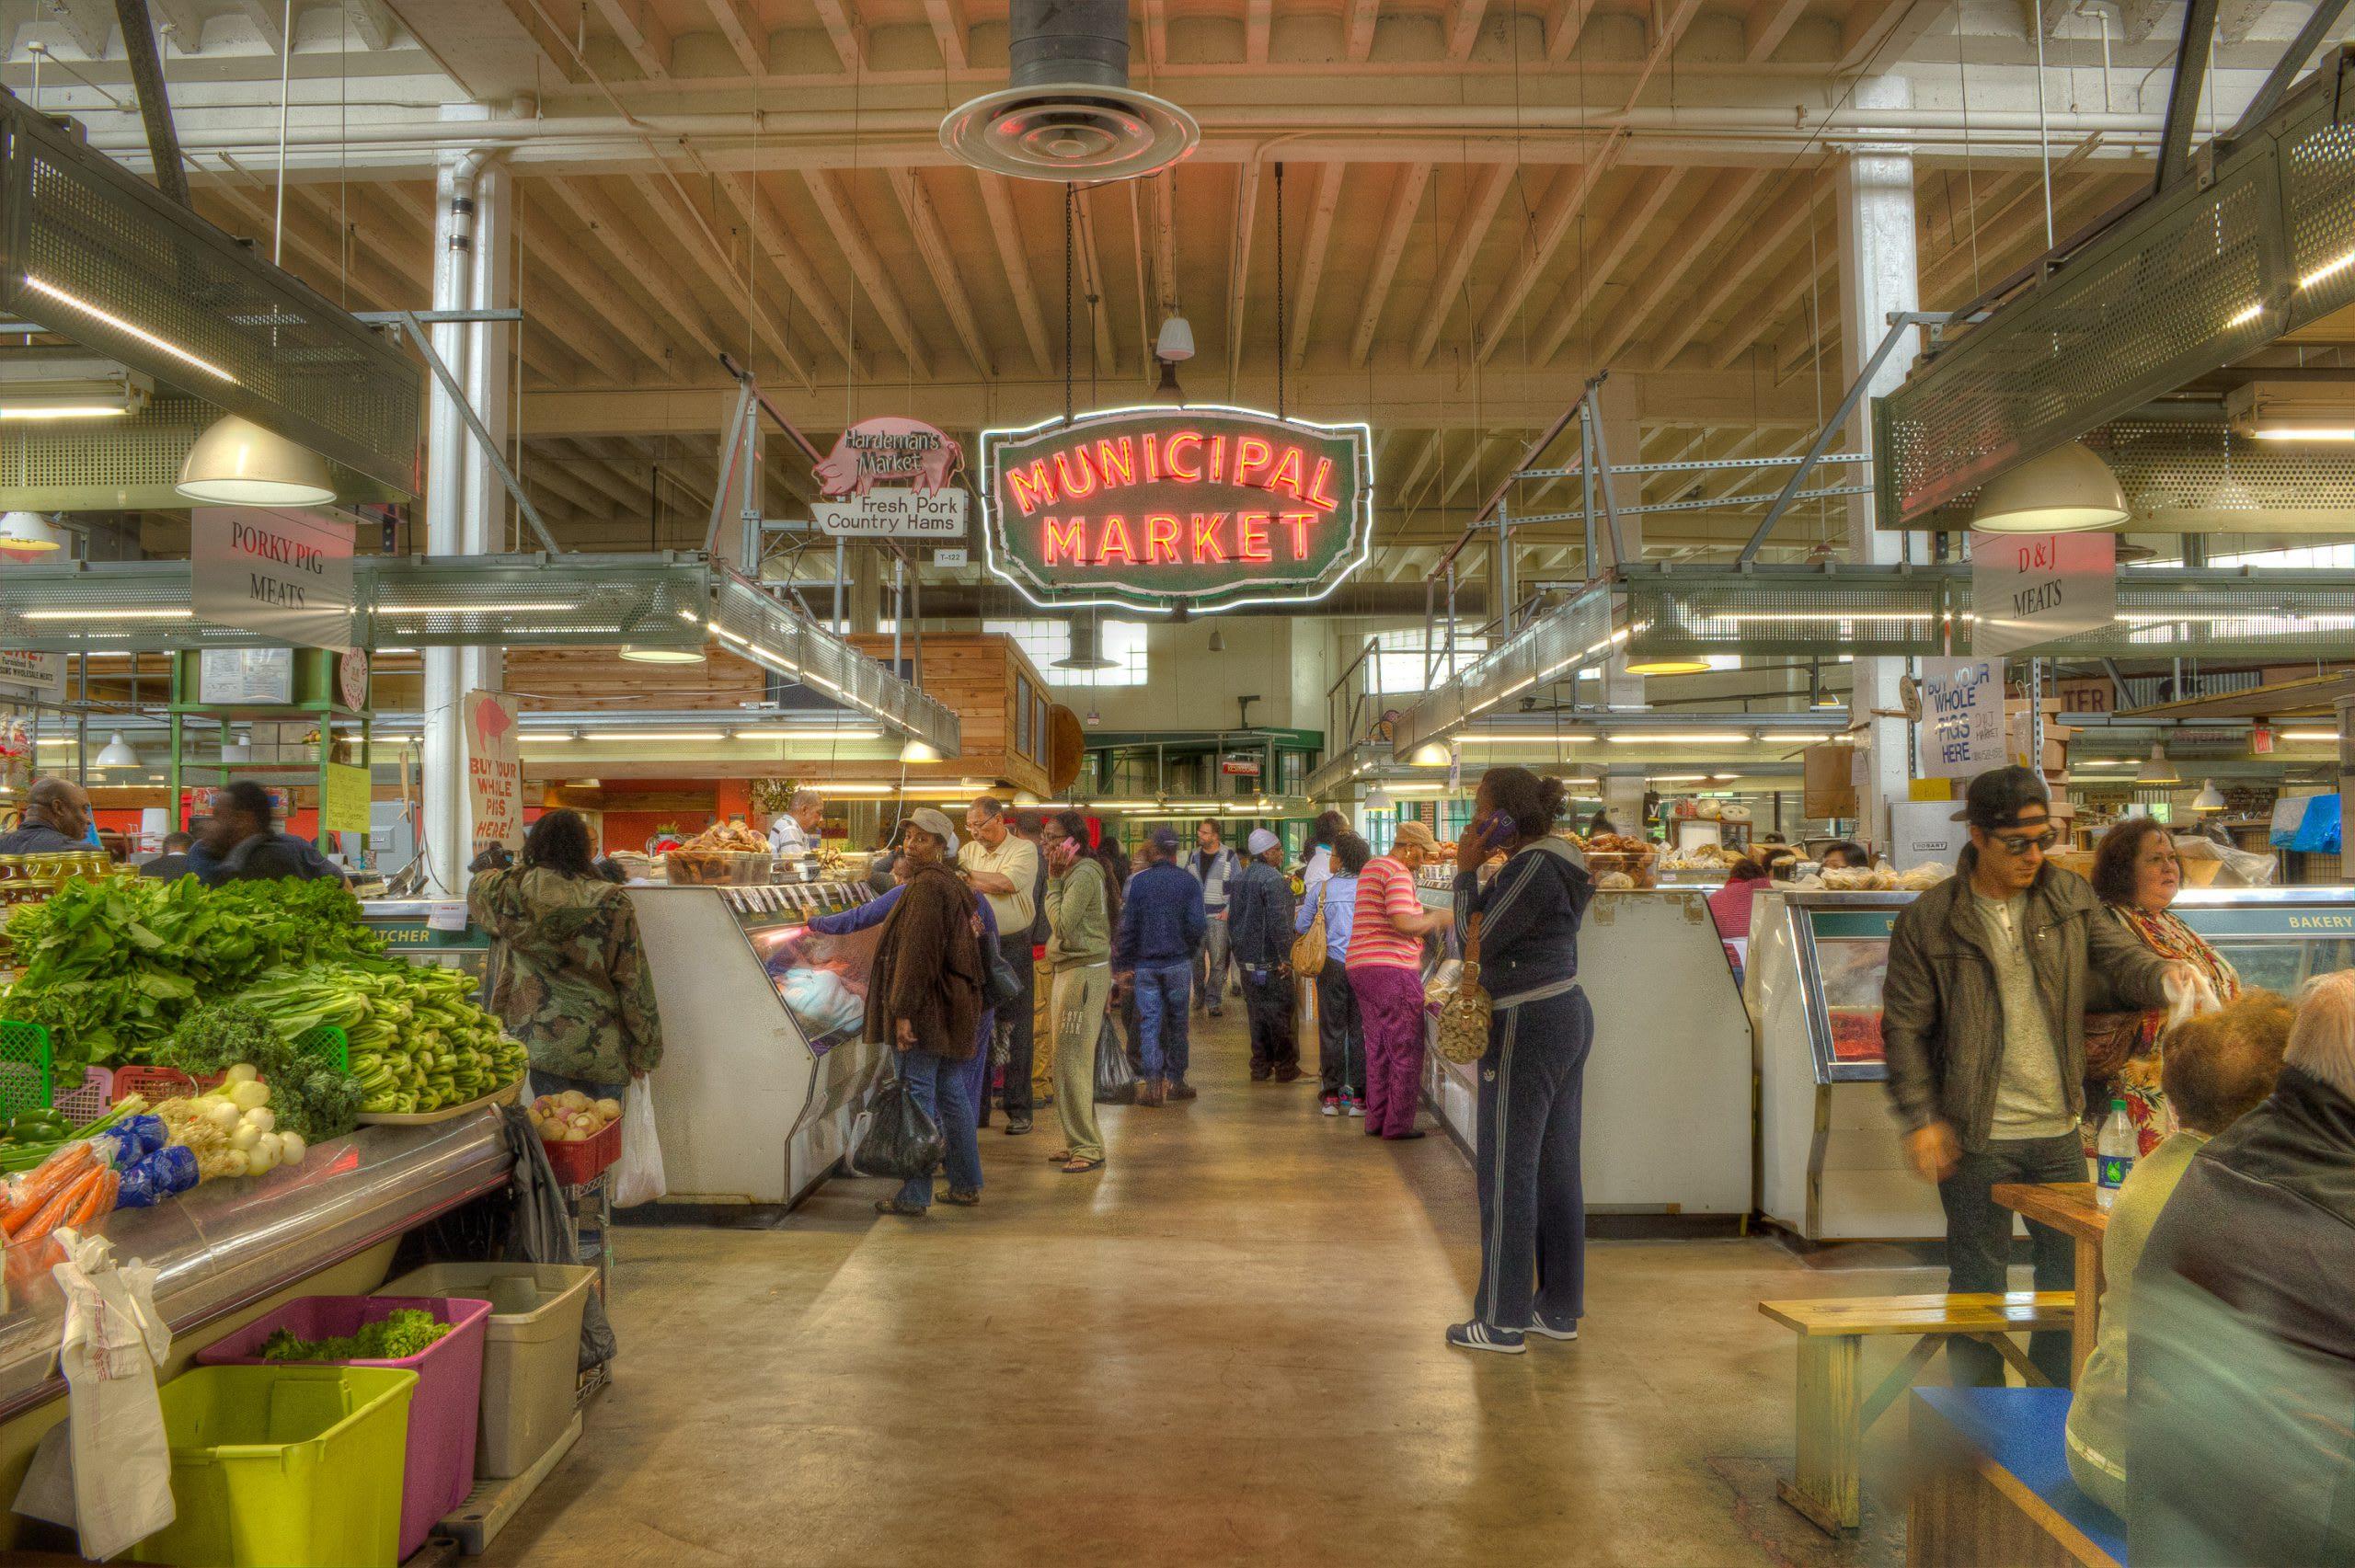 Municipal Market in Sweet Auburn Curb Market